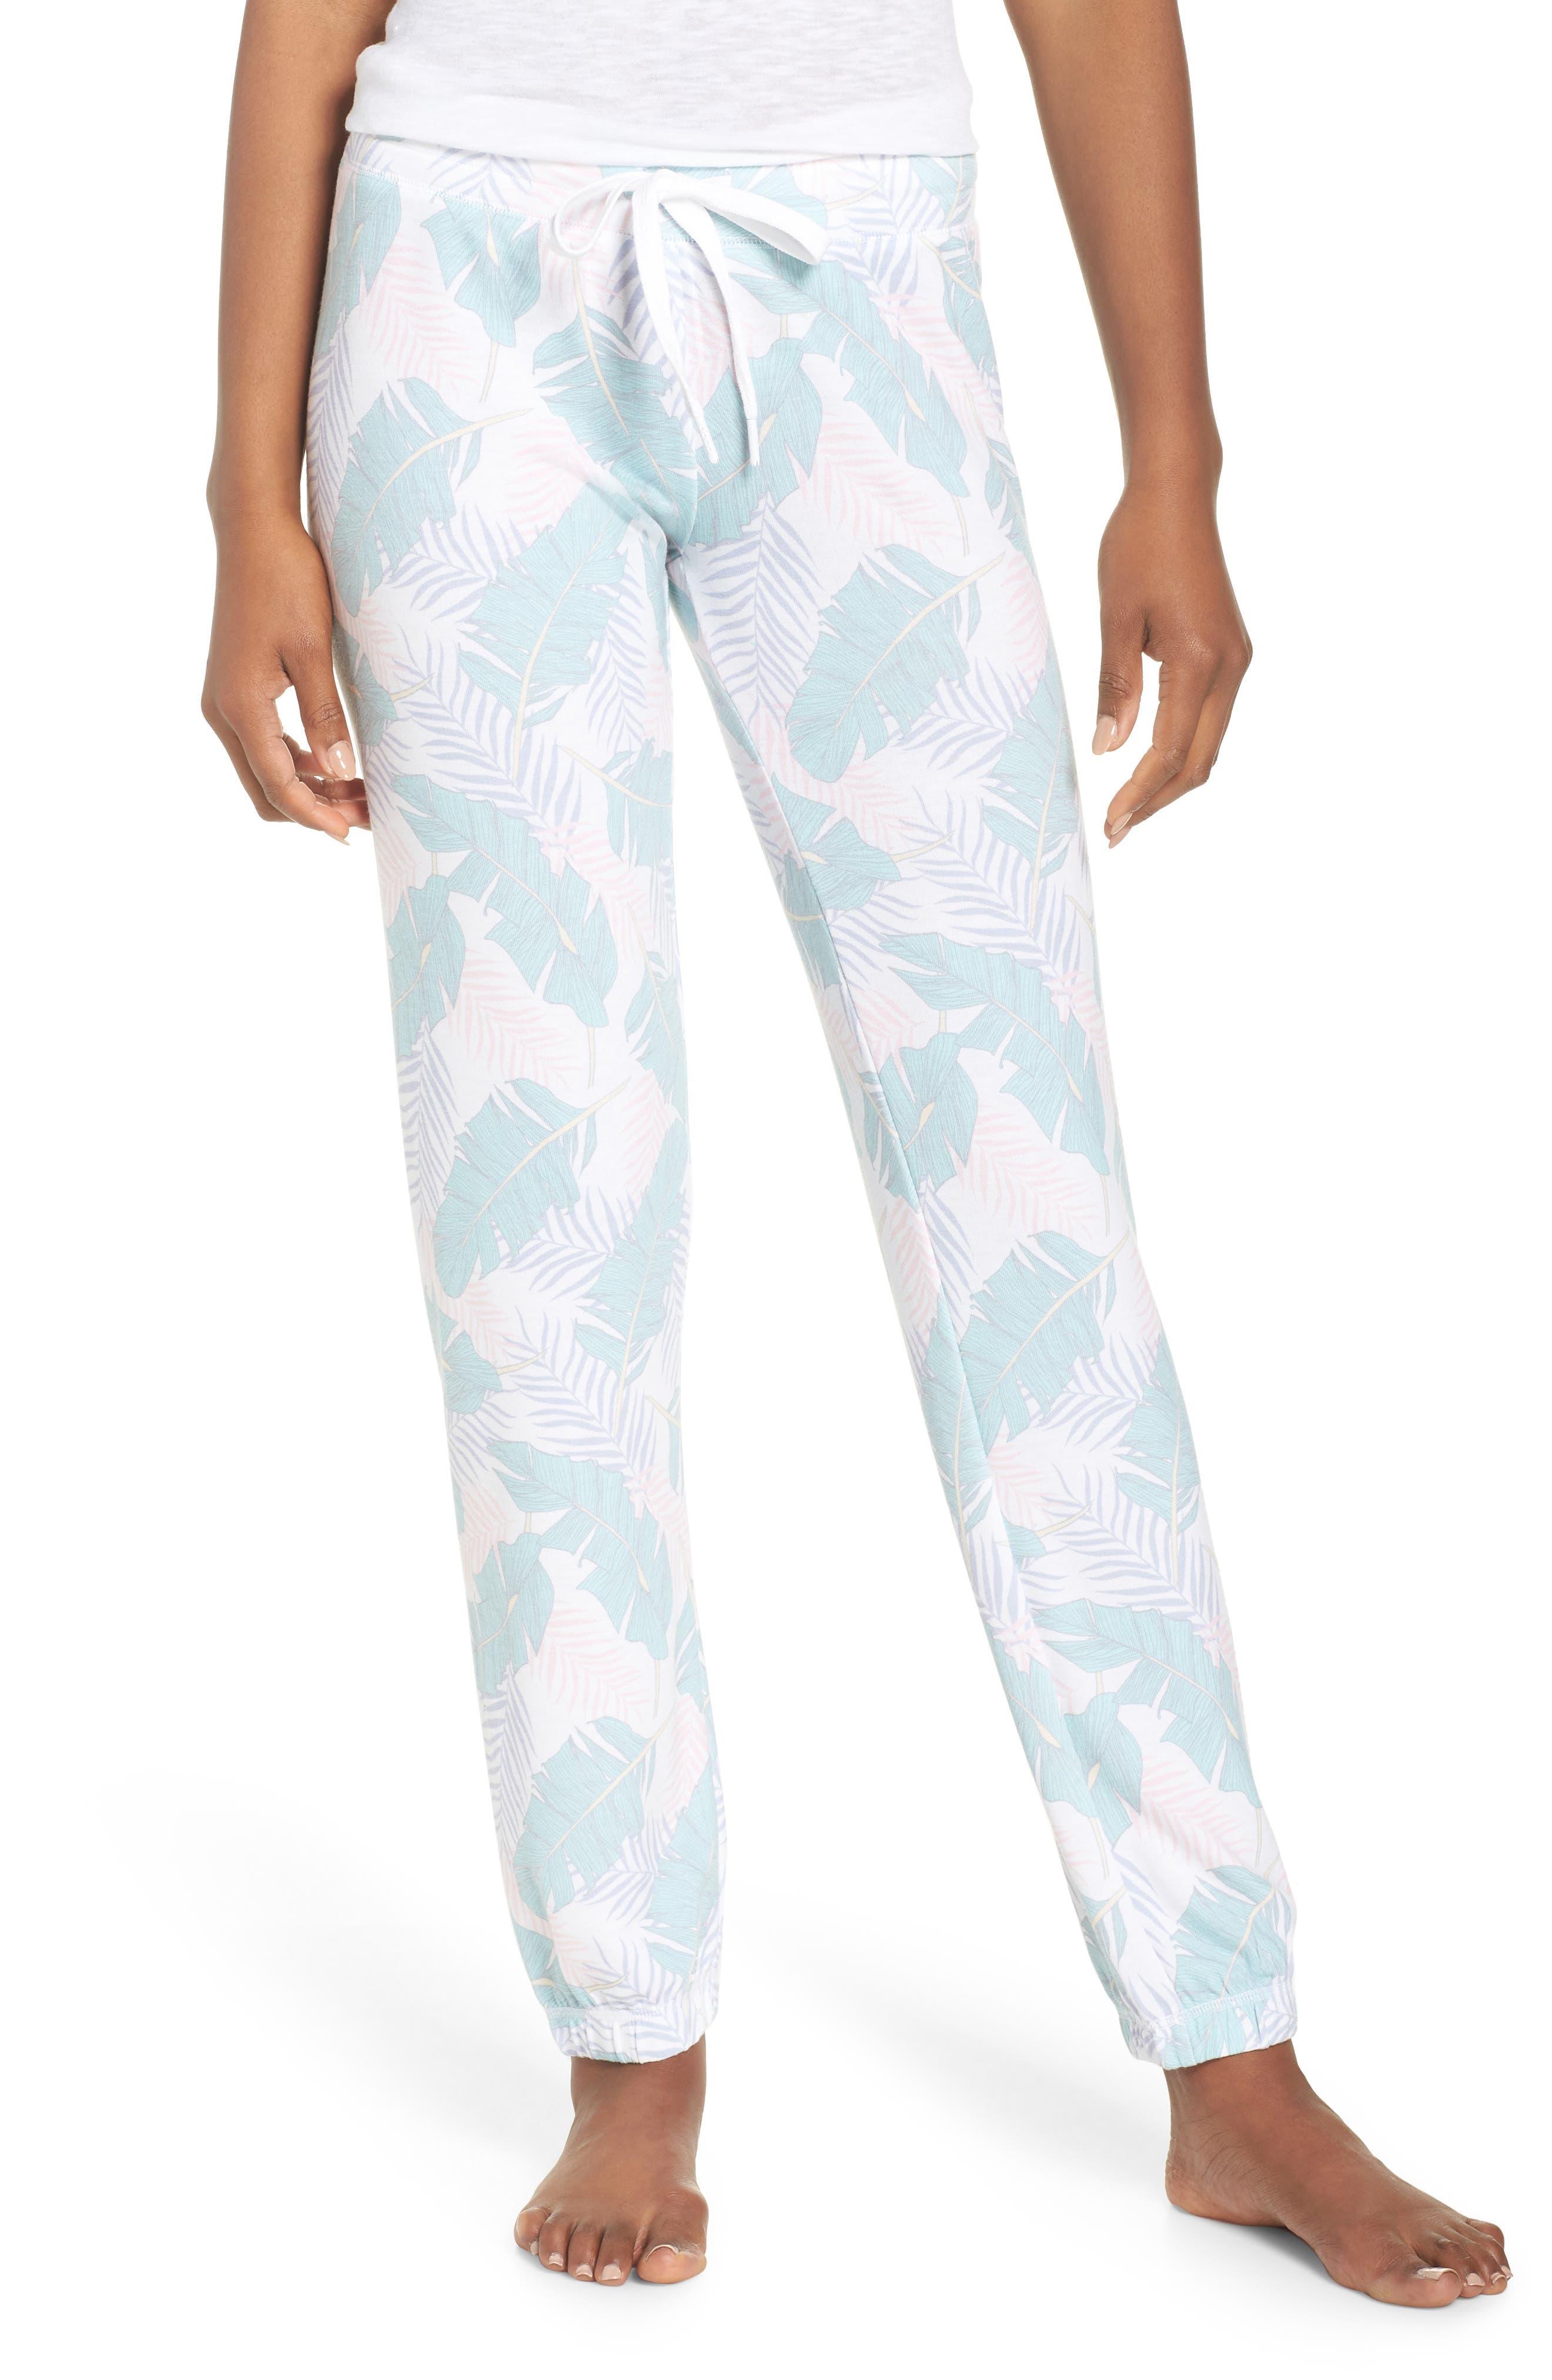 Peachy Jogger Lounge Pants,                         Main,                         color, White